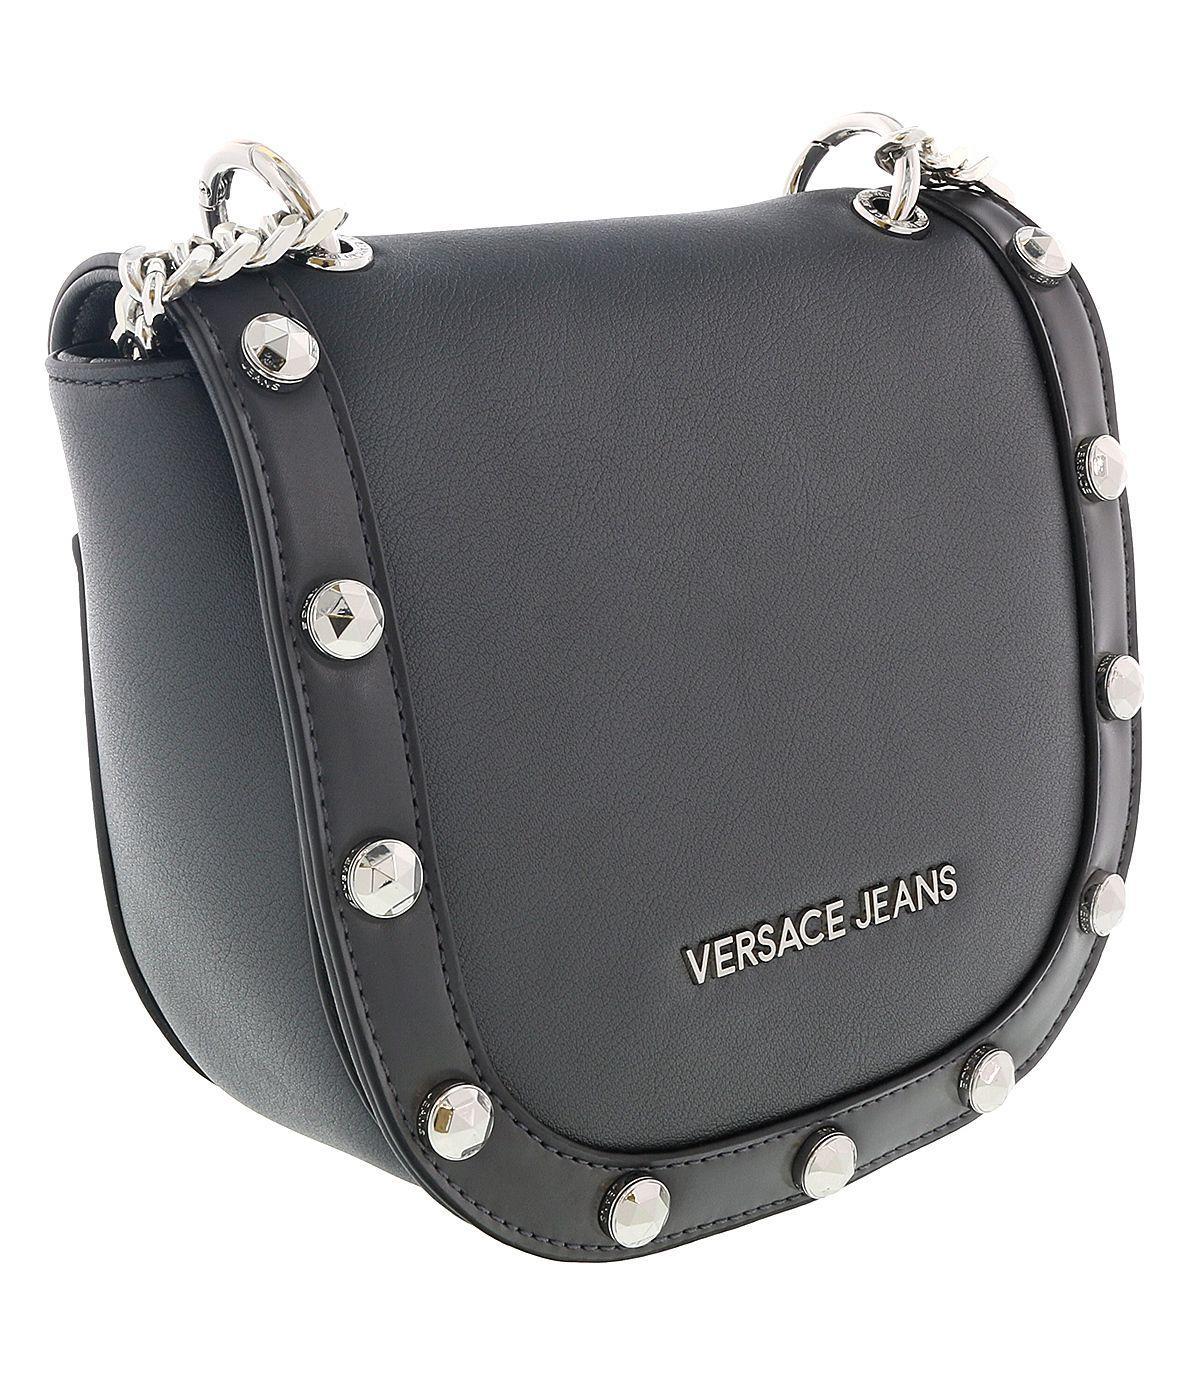 8eb9626e6899 Lyst - Versace Ee1vsbbc1 E829 Dark Grey Shoulder Bag in Gray